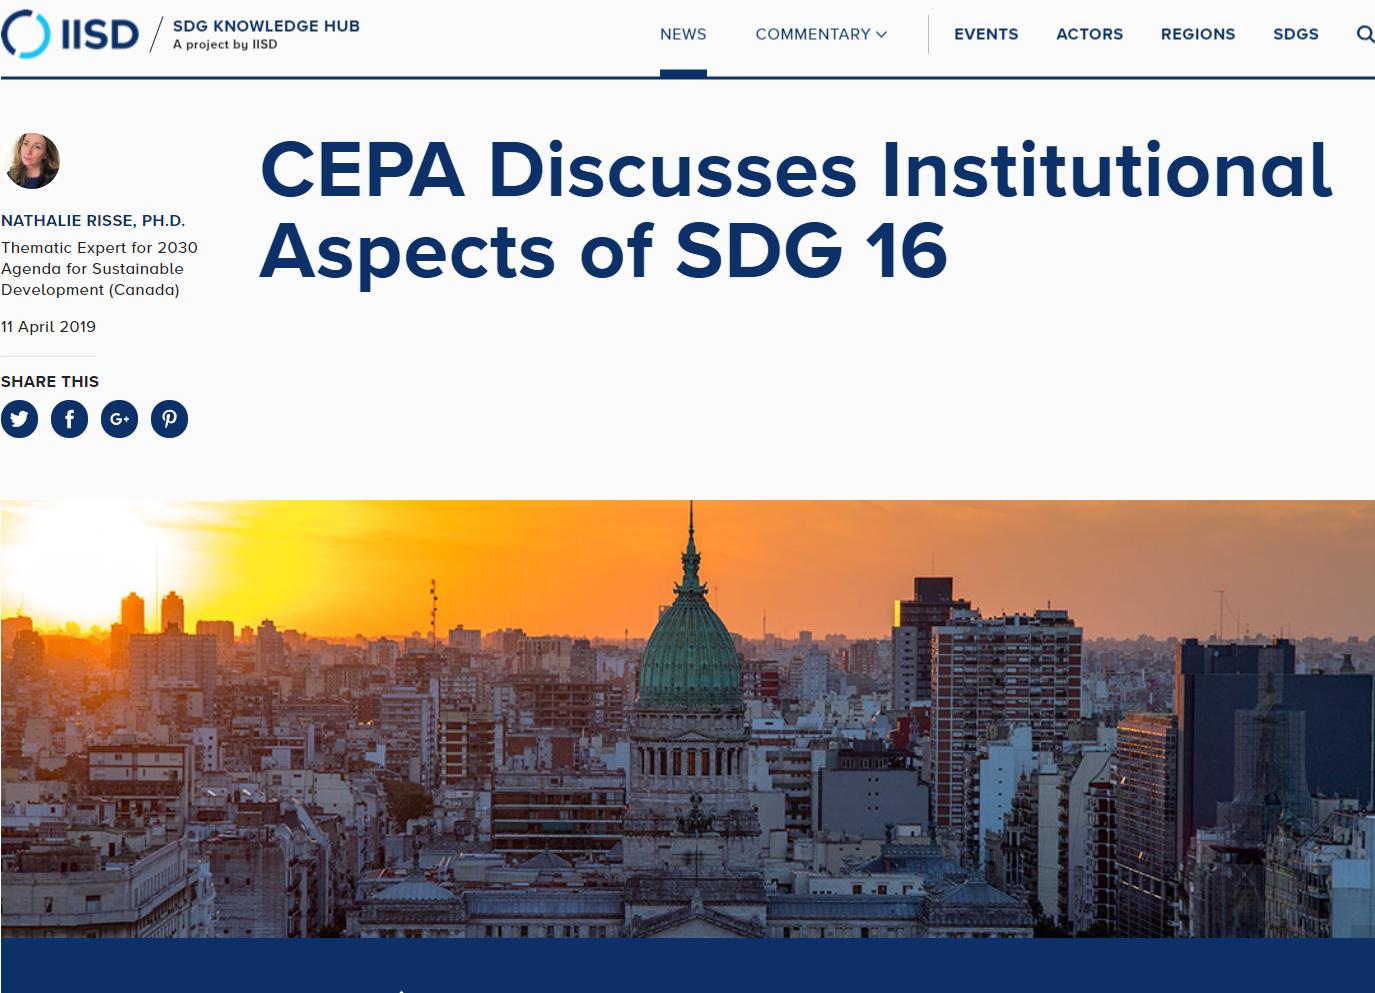 CEPA-IISDarticle2